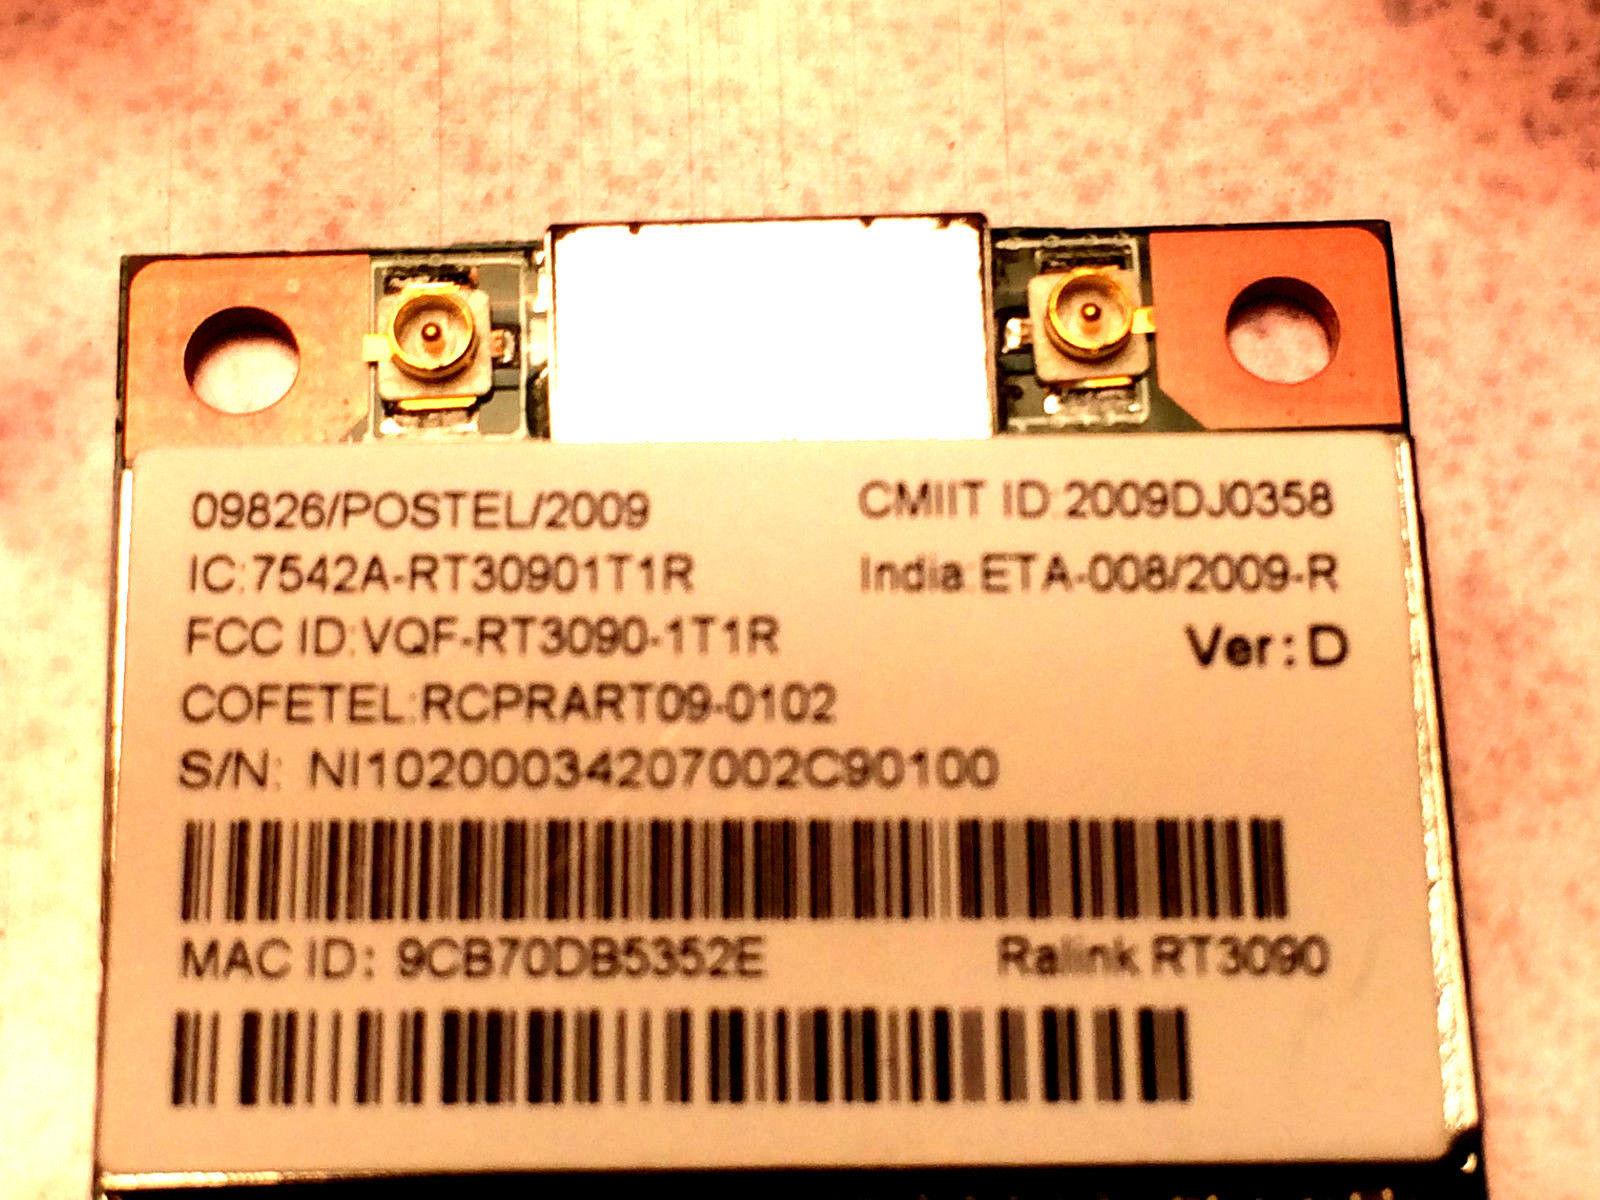 Ralink RT3090 802.11b/g/n PCI-E Half mini Wireless RT3090-1T1R New image 2